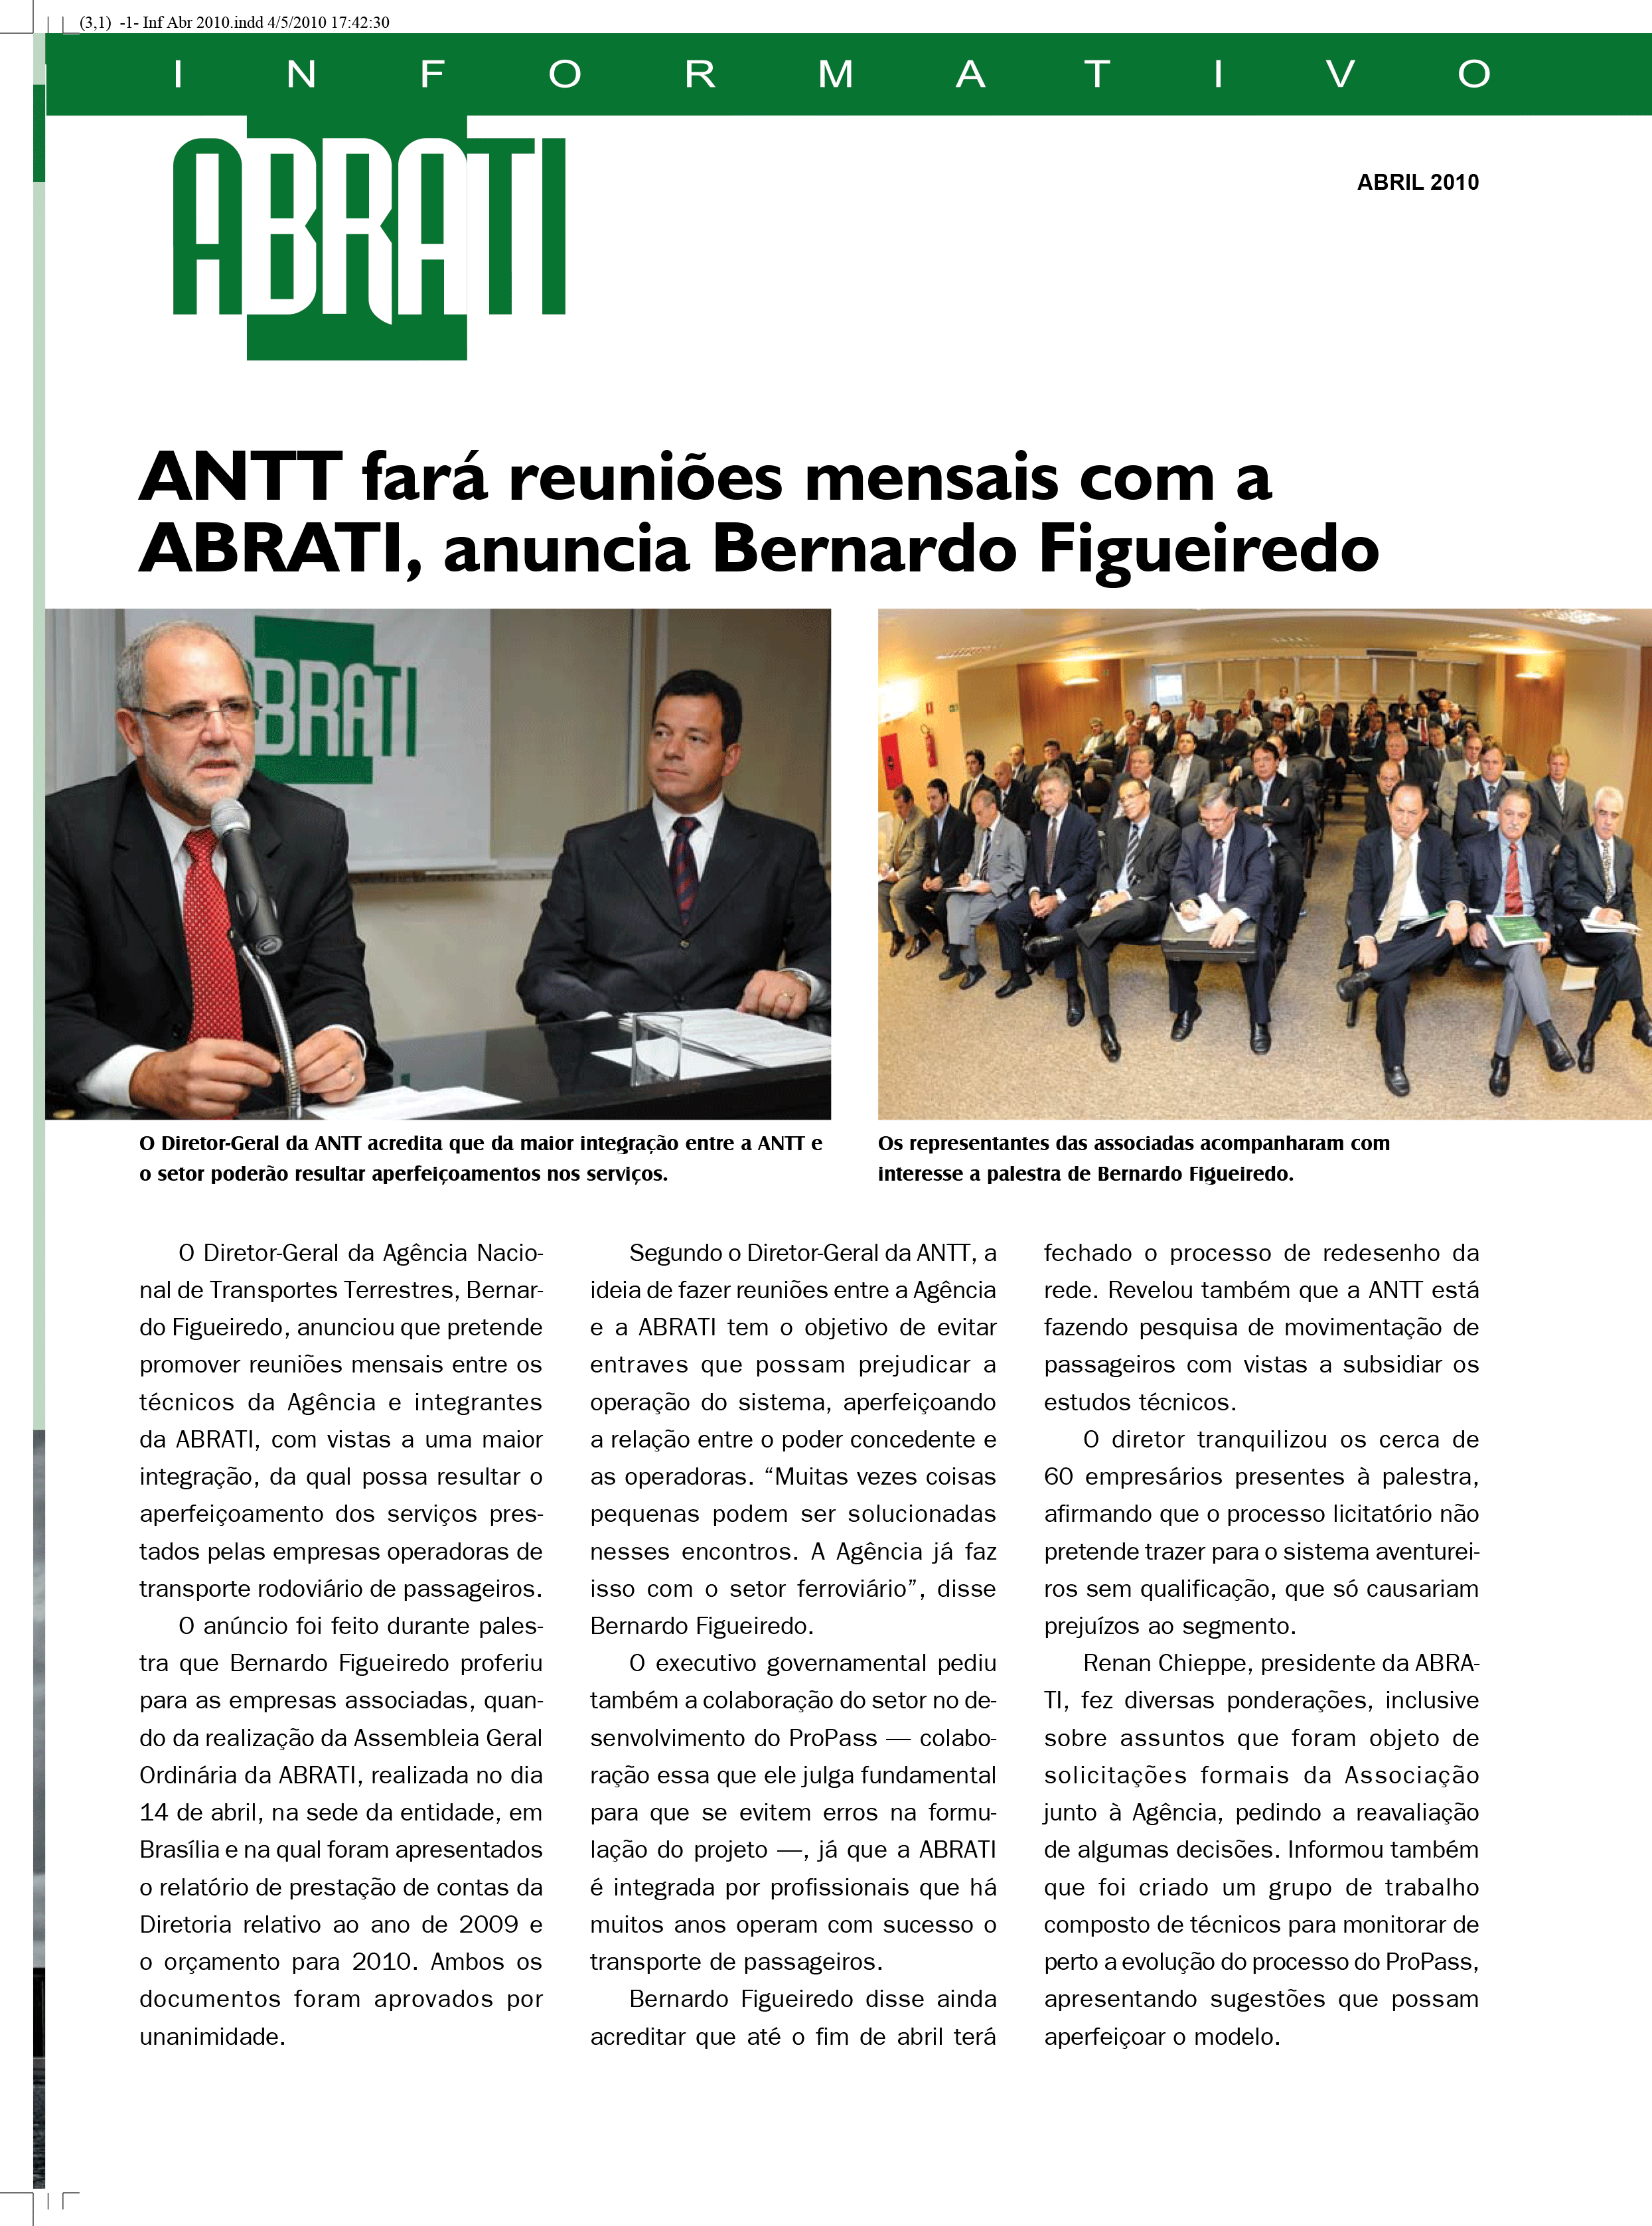 Informativo Abril 2010